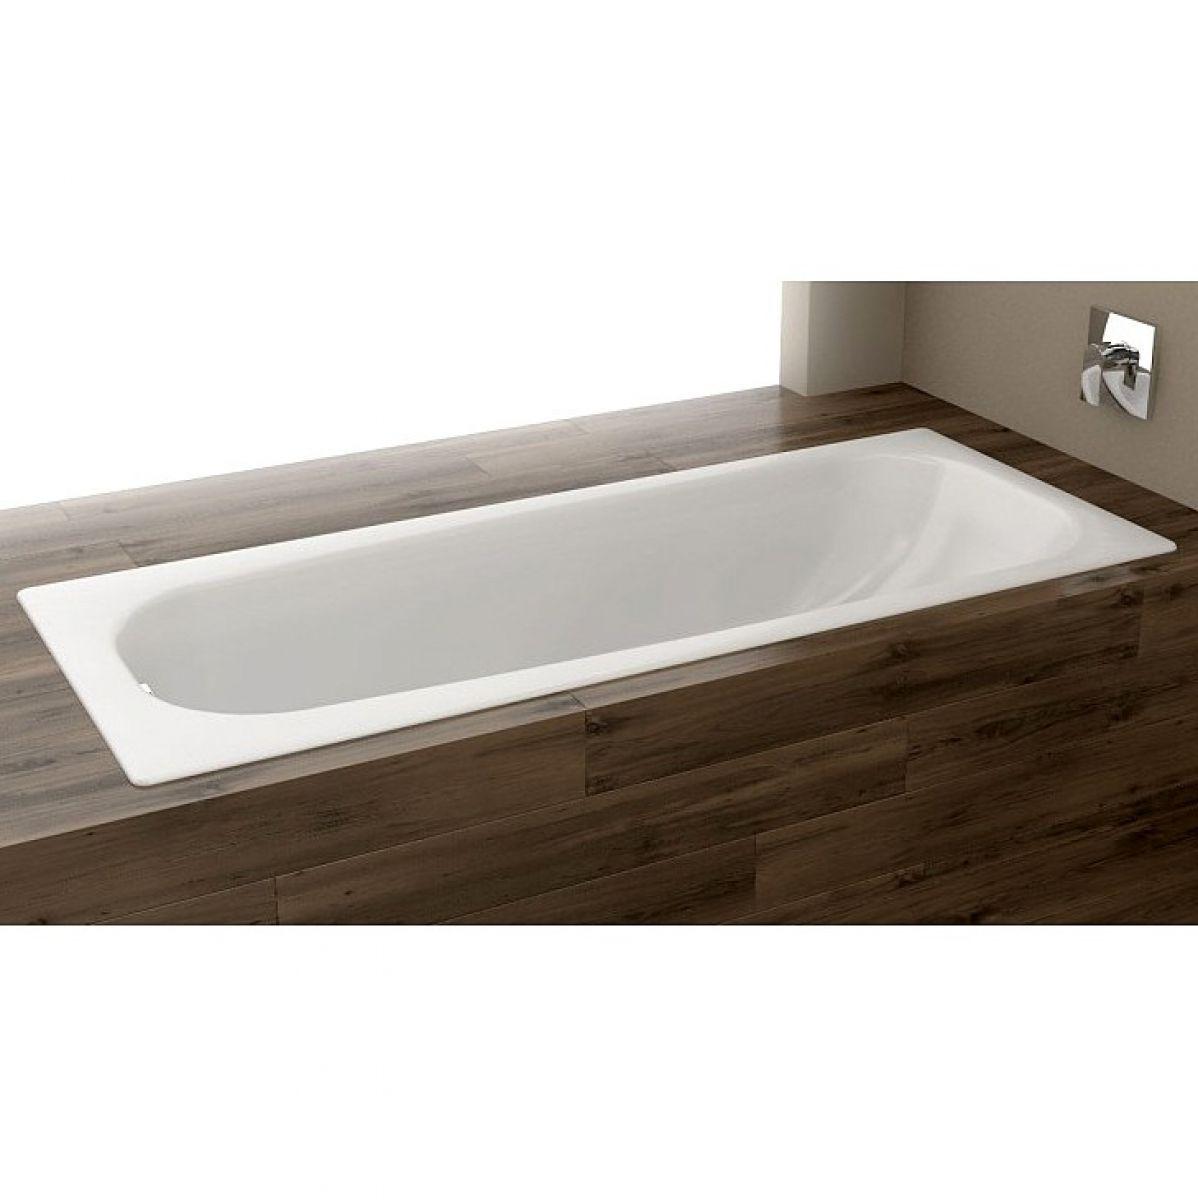 Bette Form Lowline Normal Steel Bath : UK Bathrooms